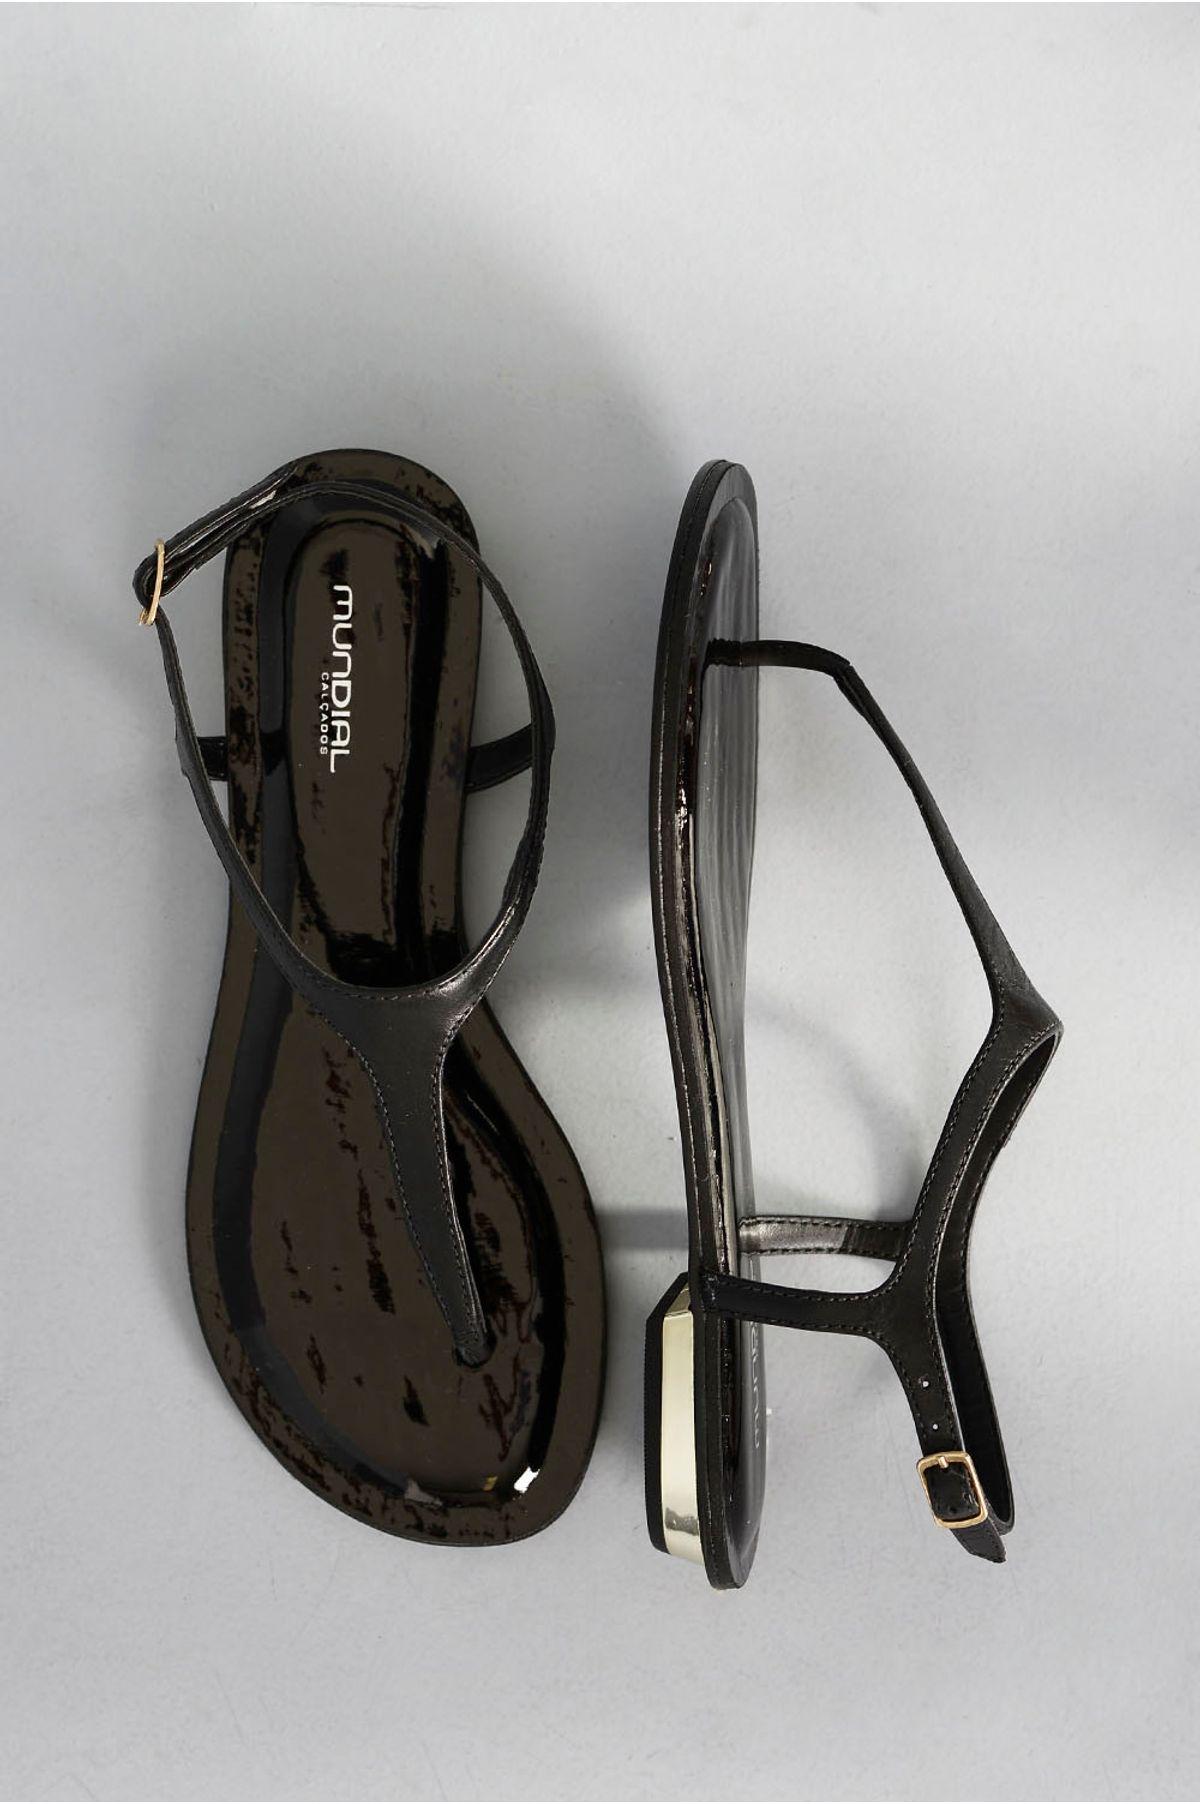 655f37d0d Sandália Feminina Rasteira Tanya Mundial | Mundial Calçados ...